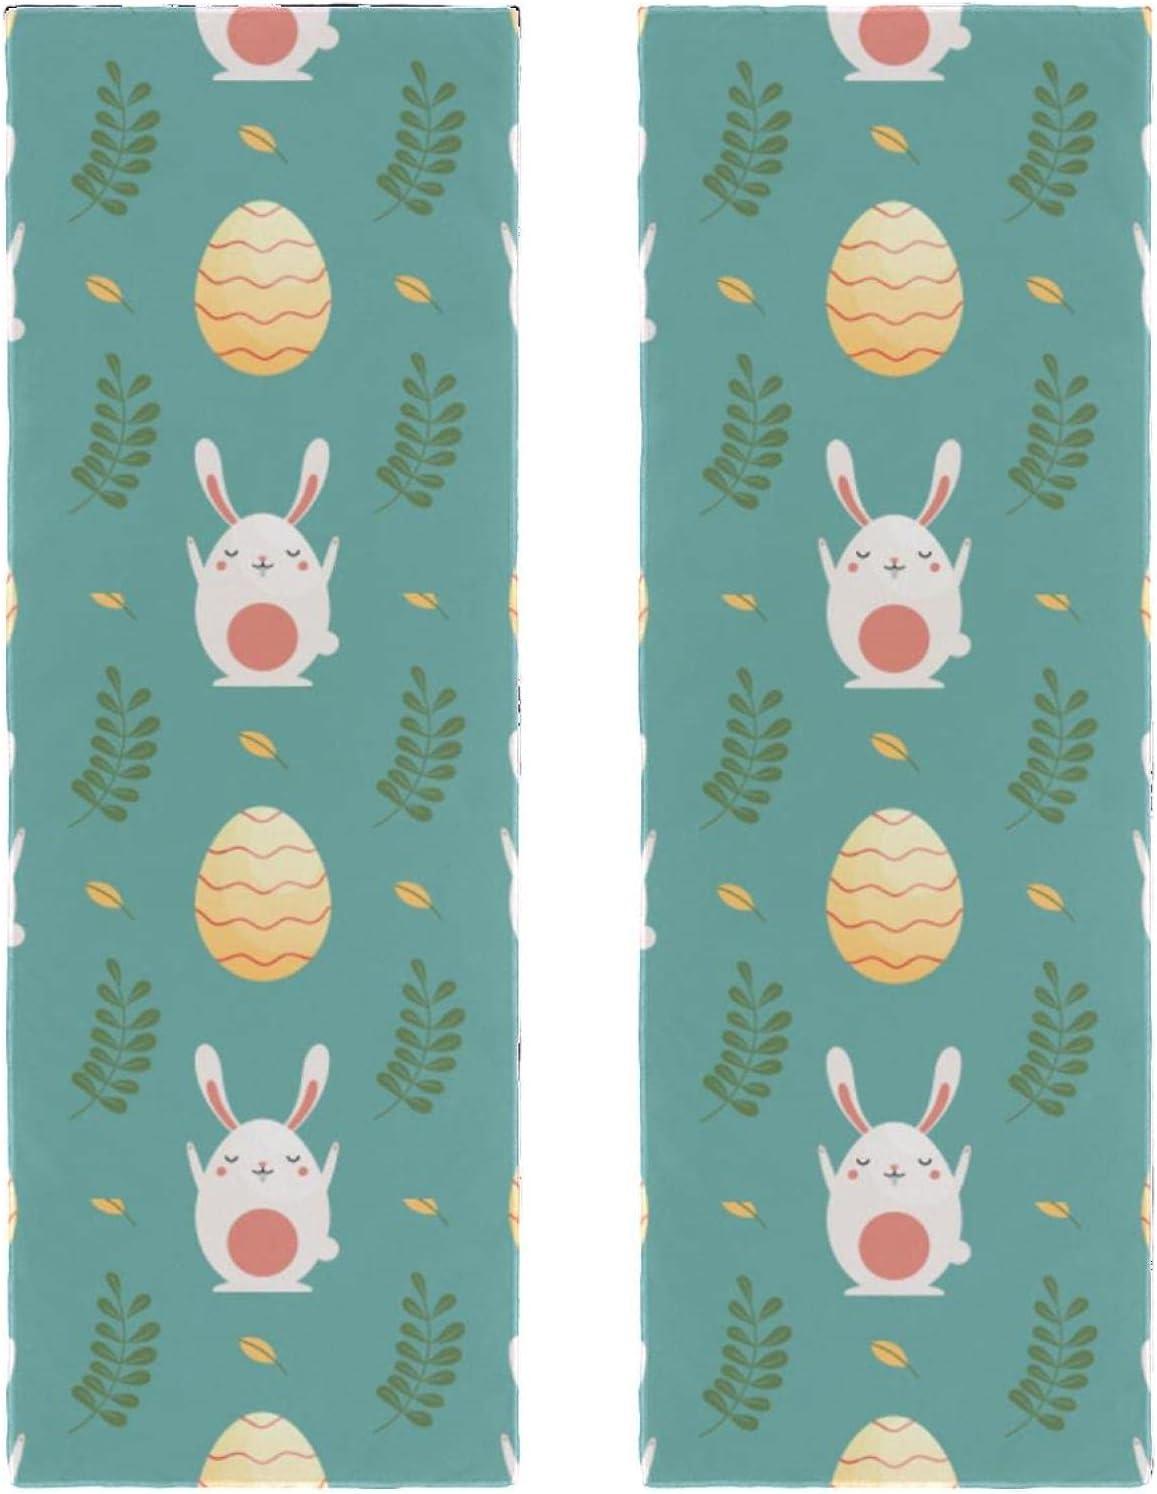 Fast Drying Microfiber Towels 2 Packs Cartoon Cute Egg 2021 new Rabbit sale